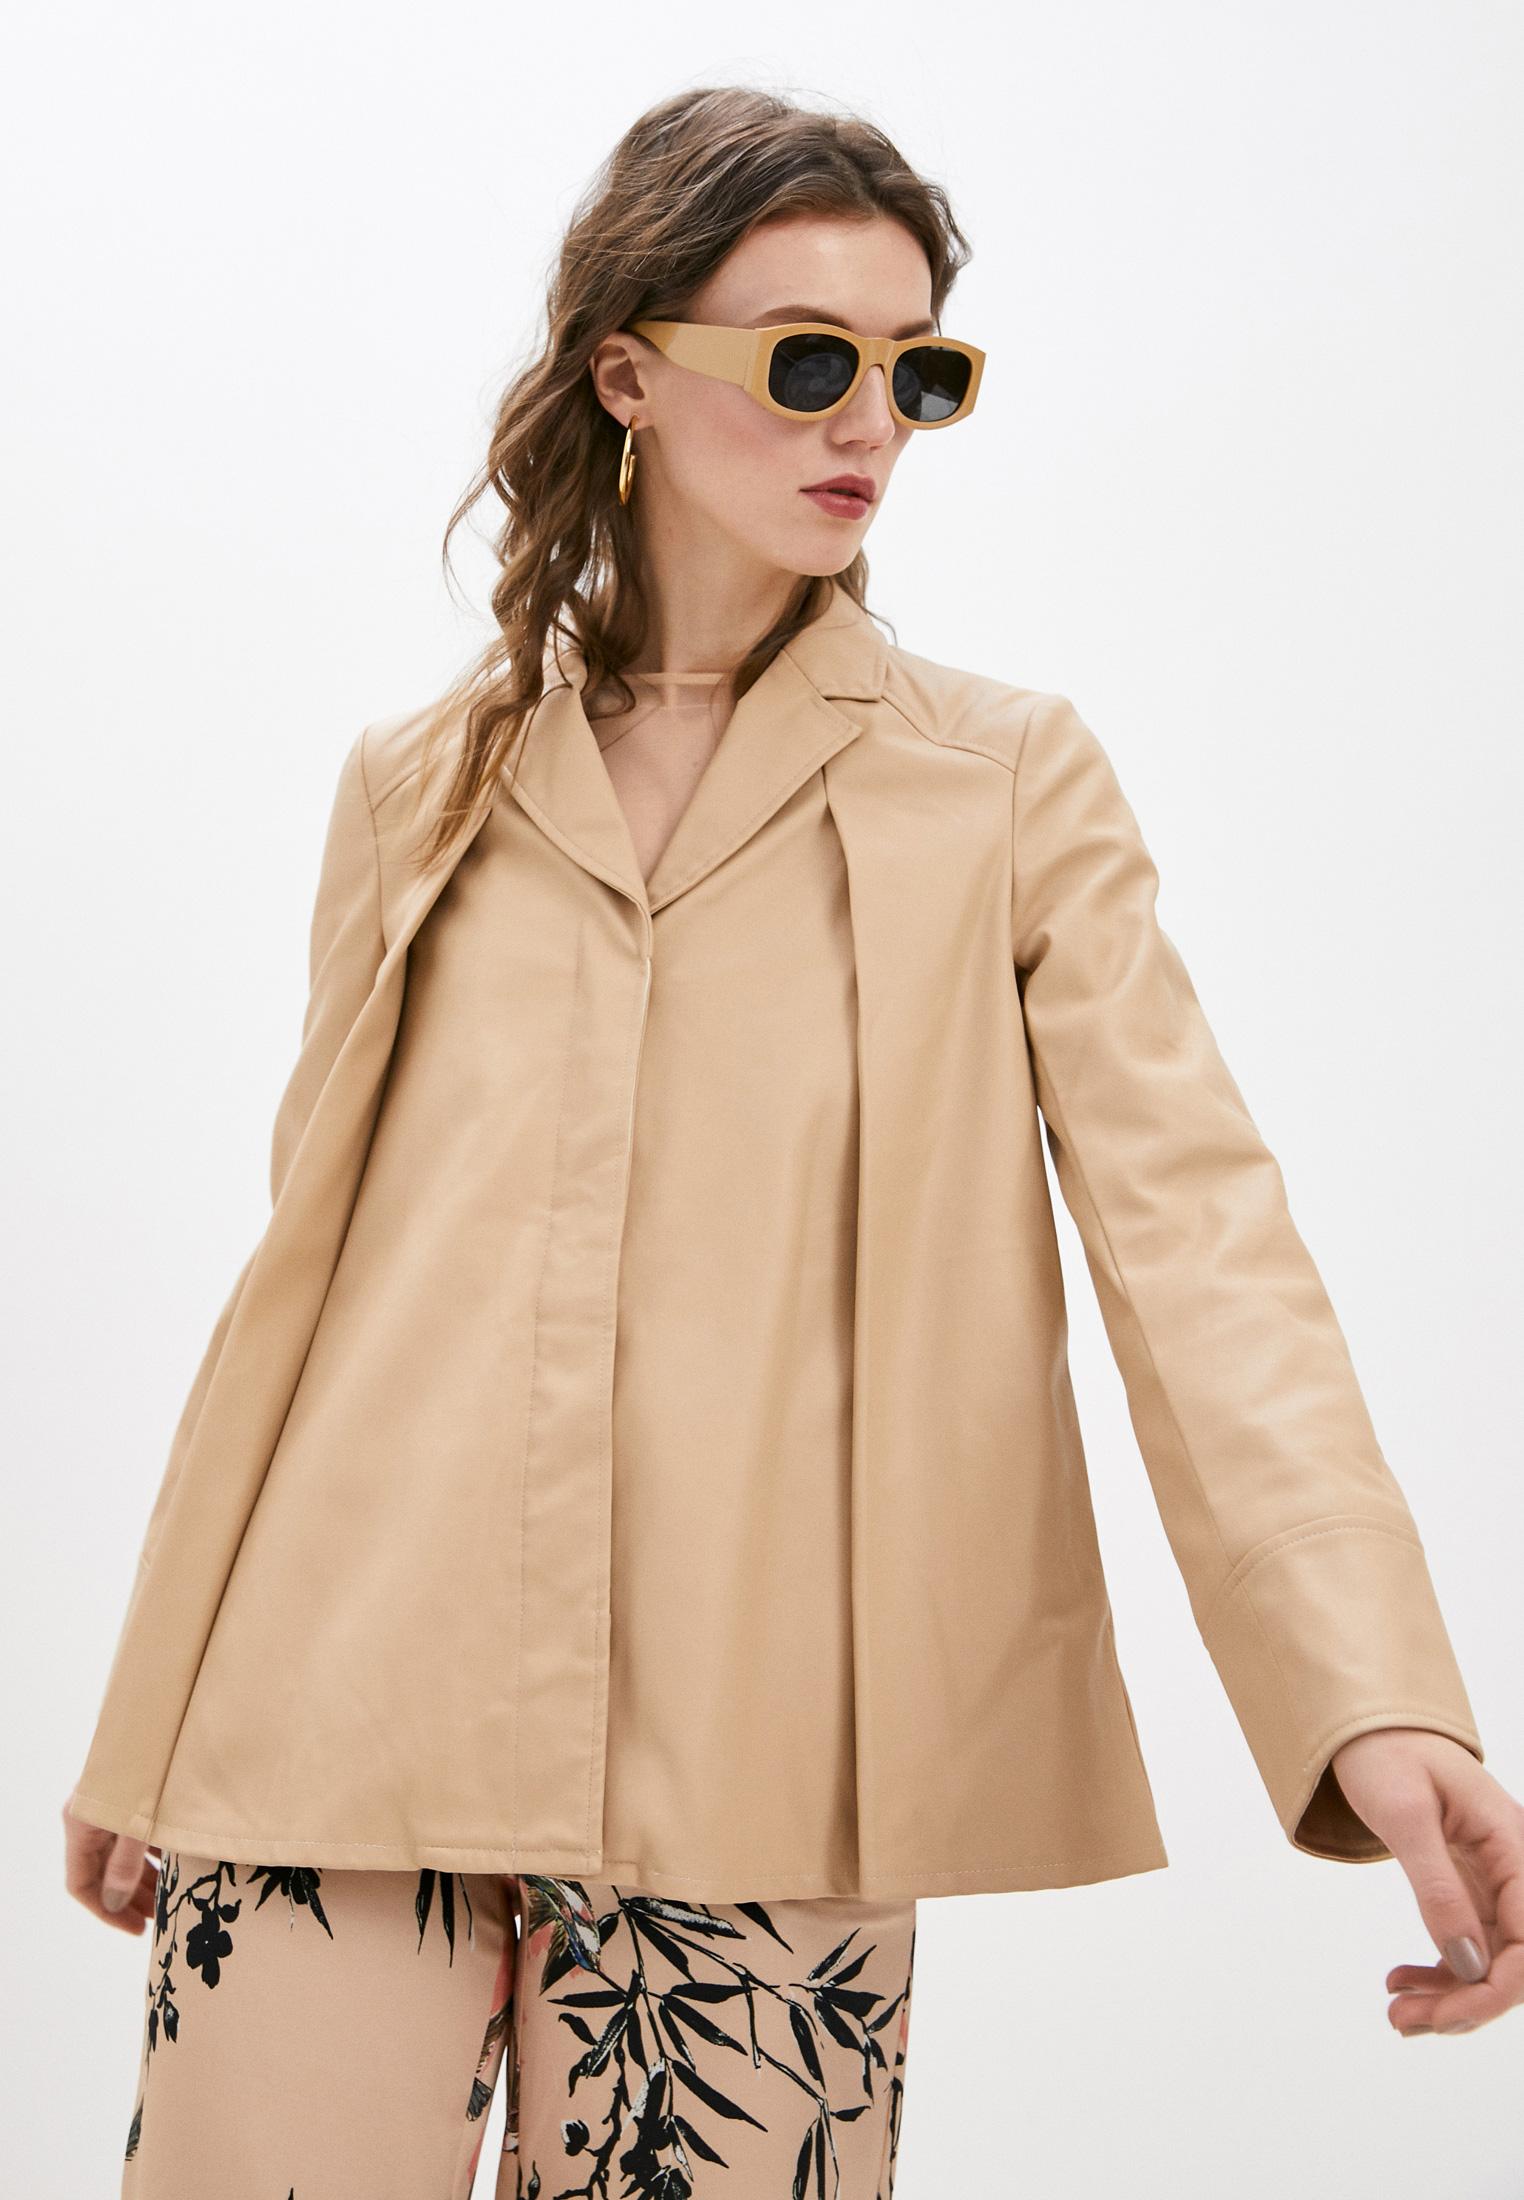 Кожаная куртка Patrizia Pepe (Патриция Пепе) 8L0118 A1DZ B524